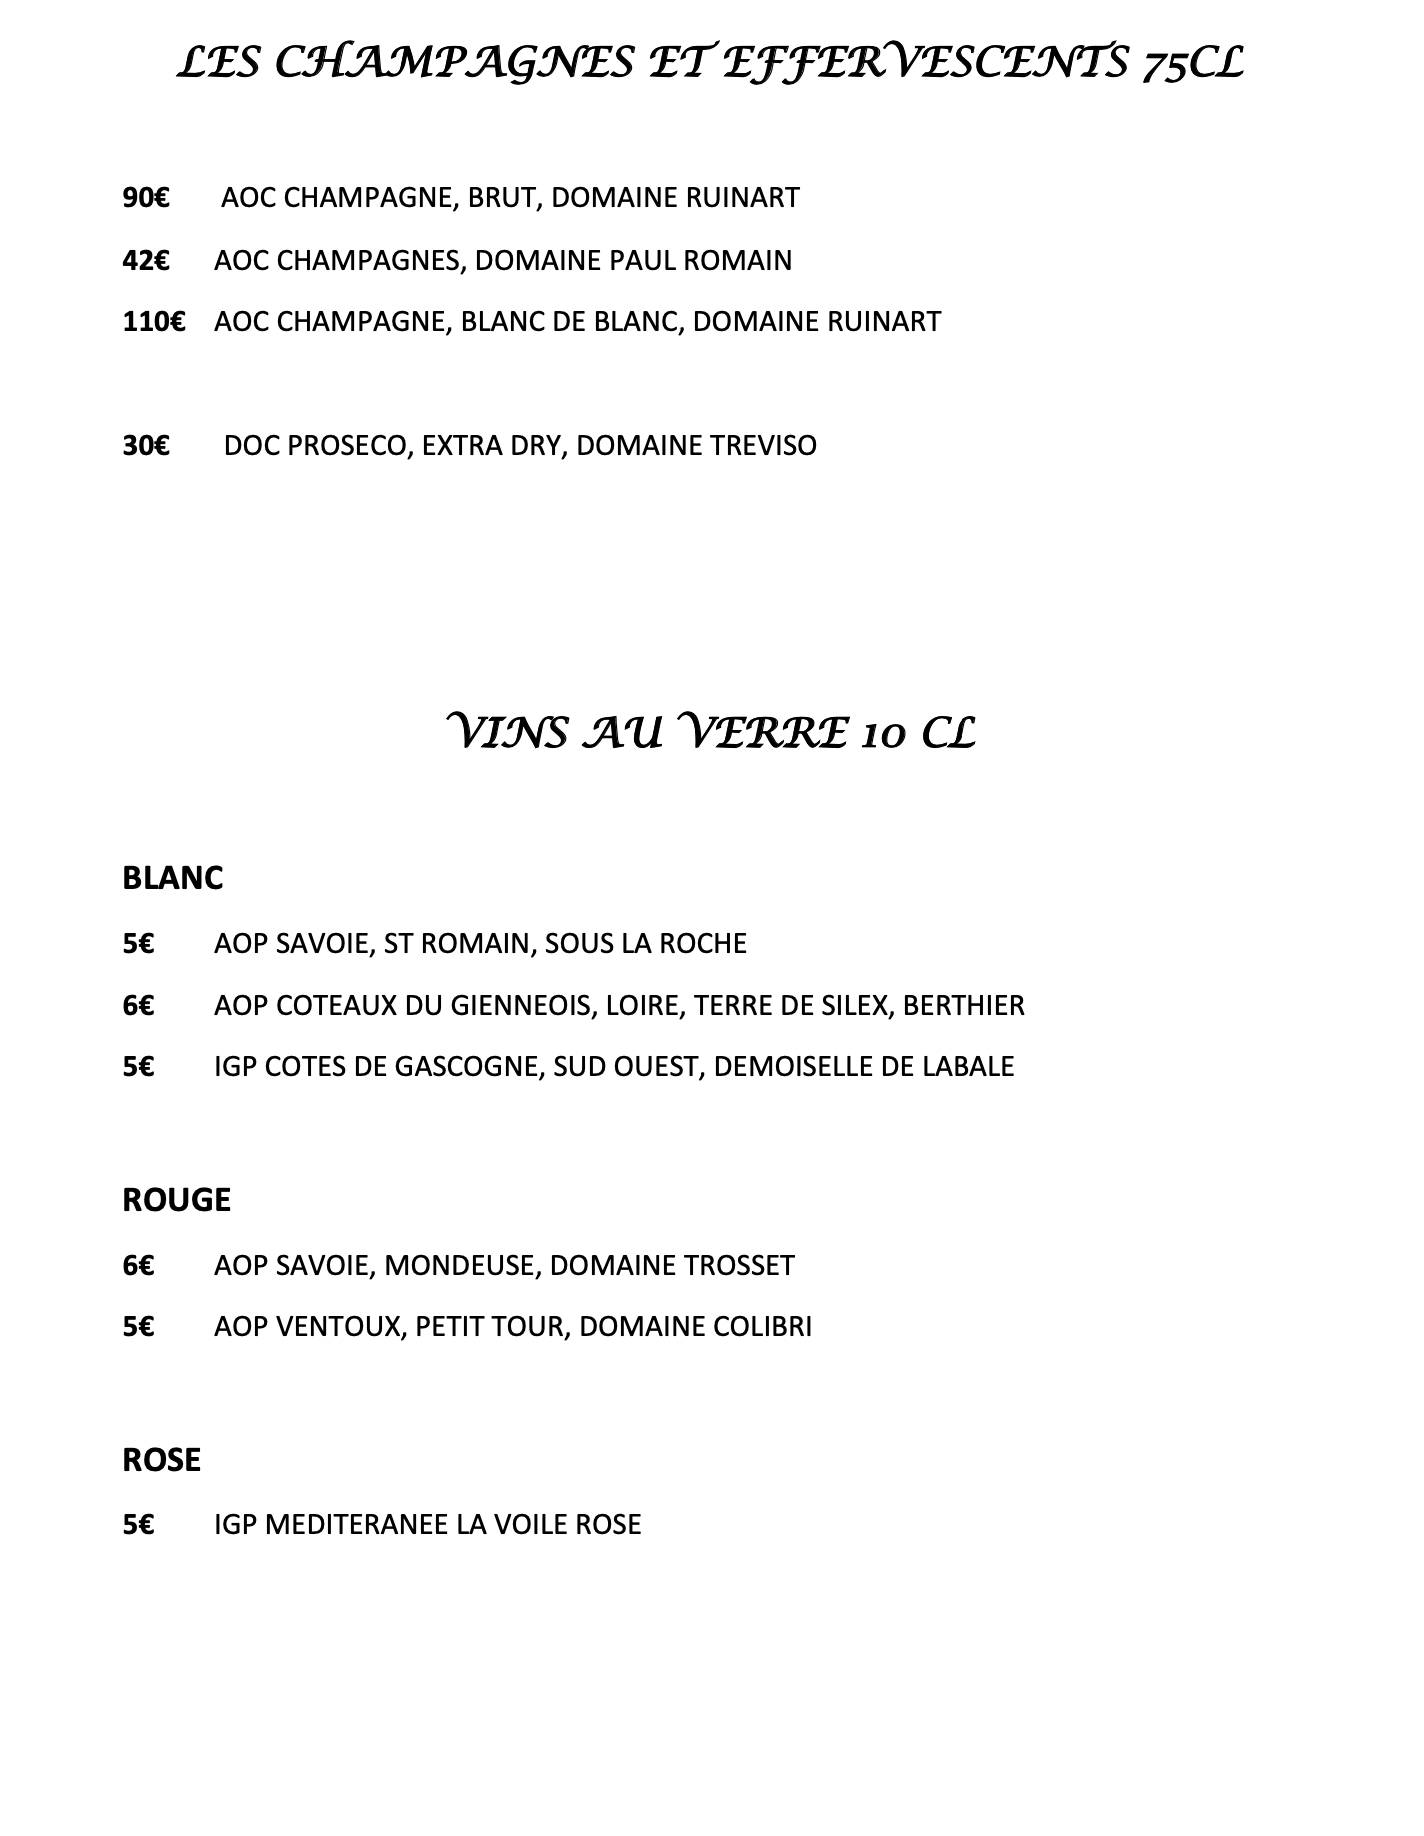 Cartes des vins - 2:6